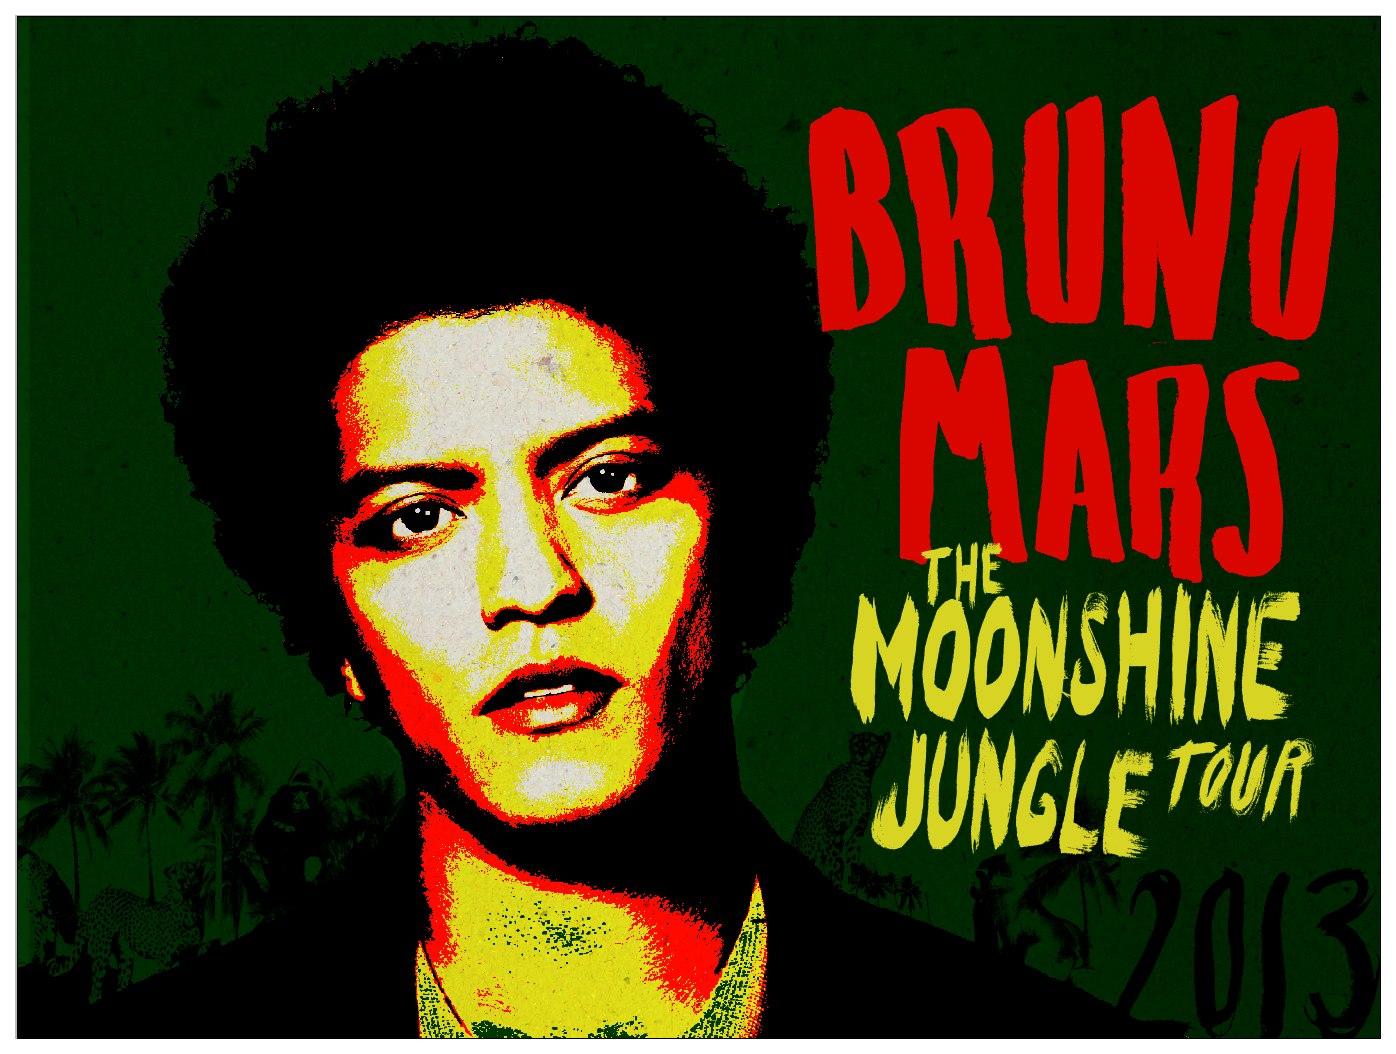 bruno mars concert the mooshine tour